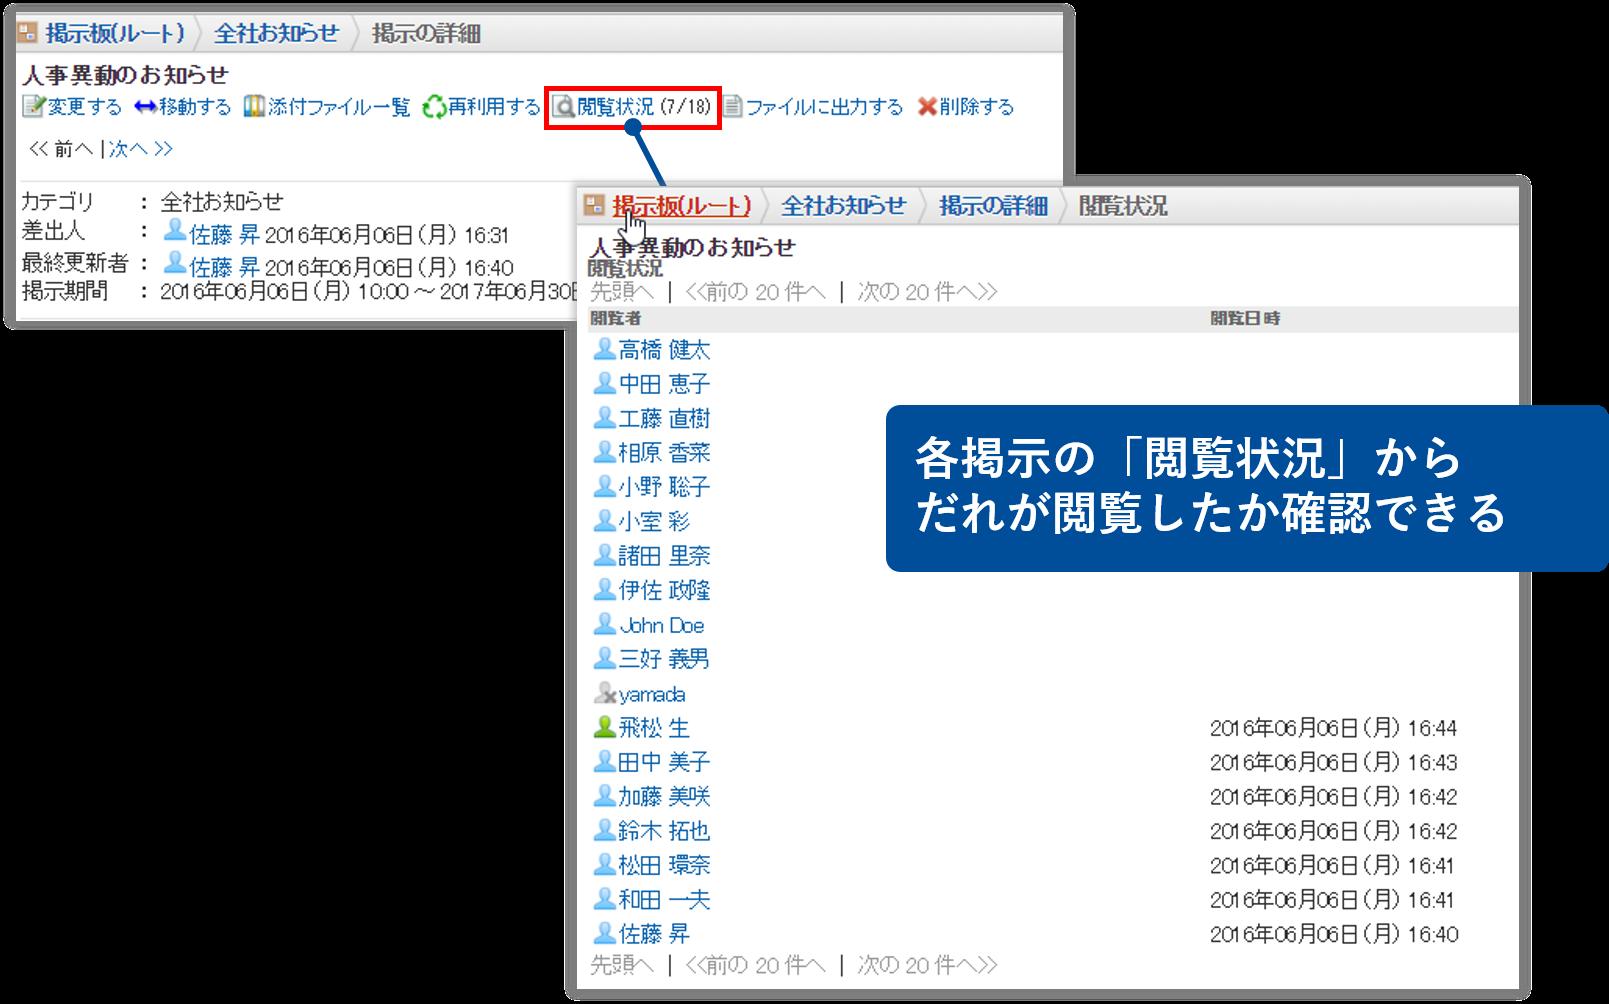 https://enterprise.cybozu.co.jp/7bebf3b73454a860ab9f0b27562c04d200369ddf.png